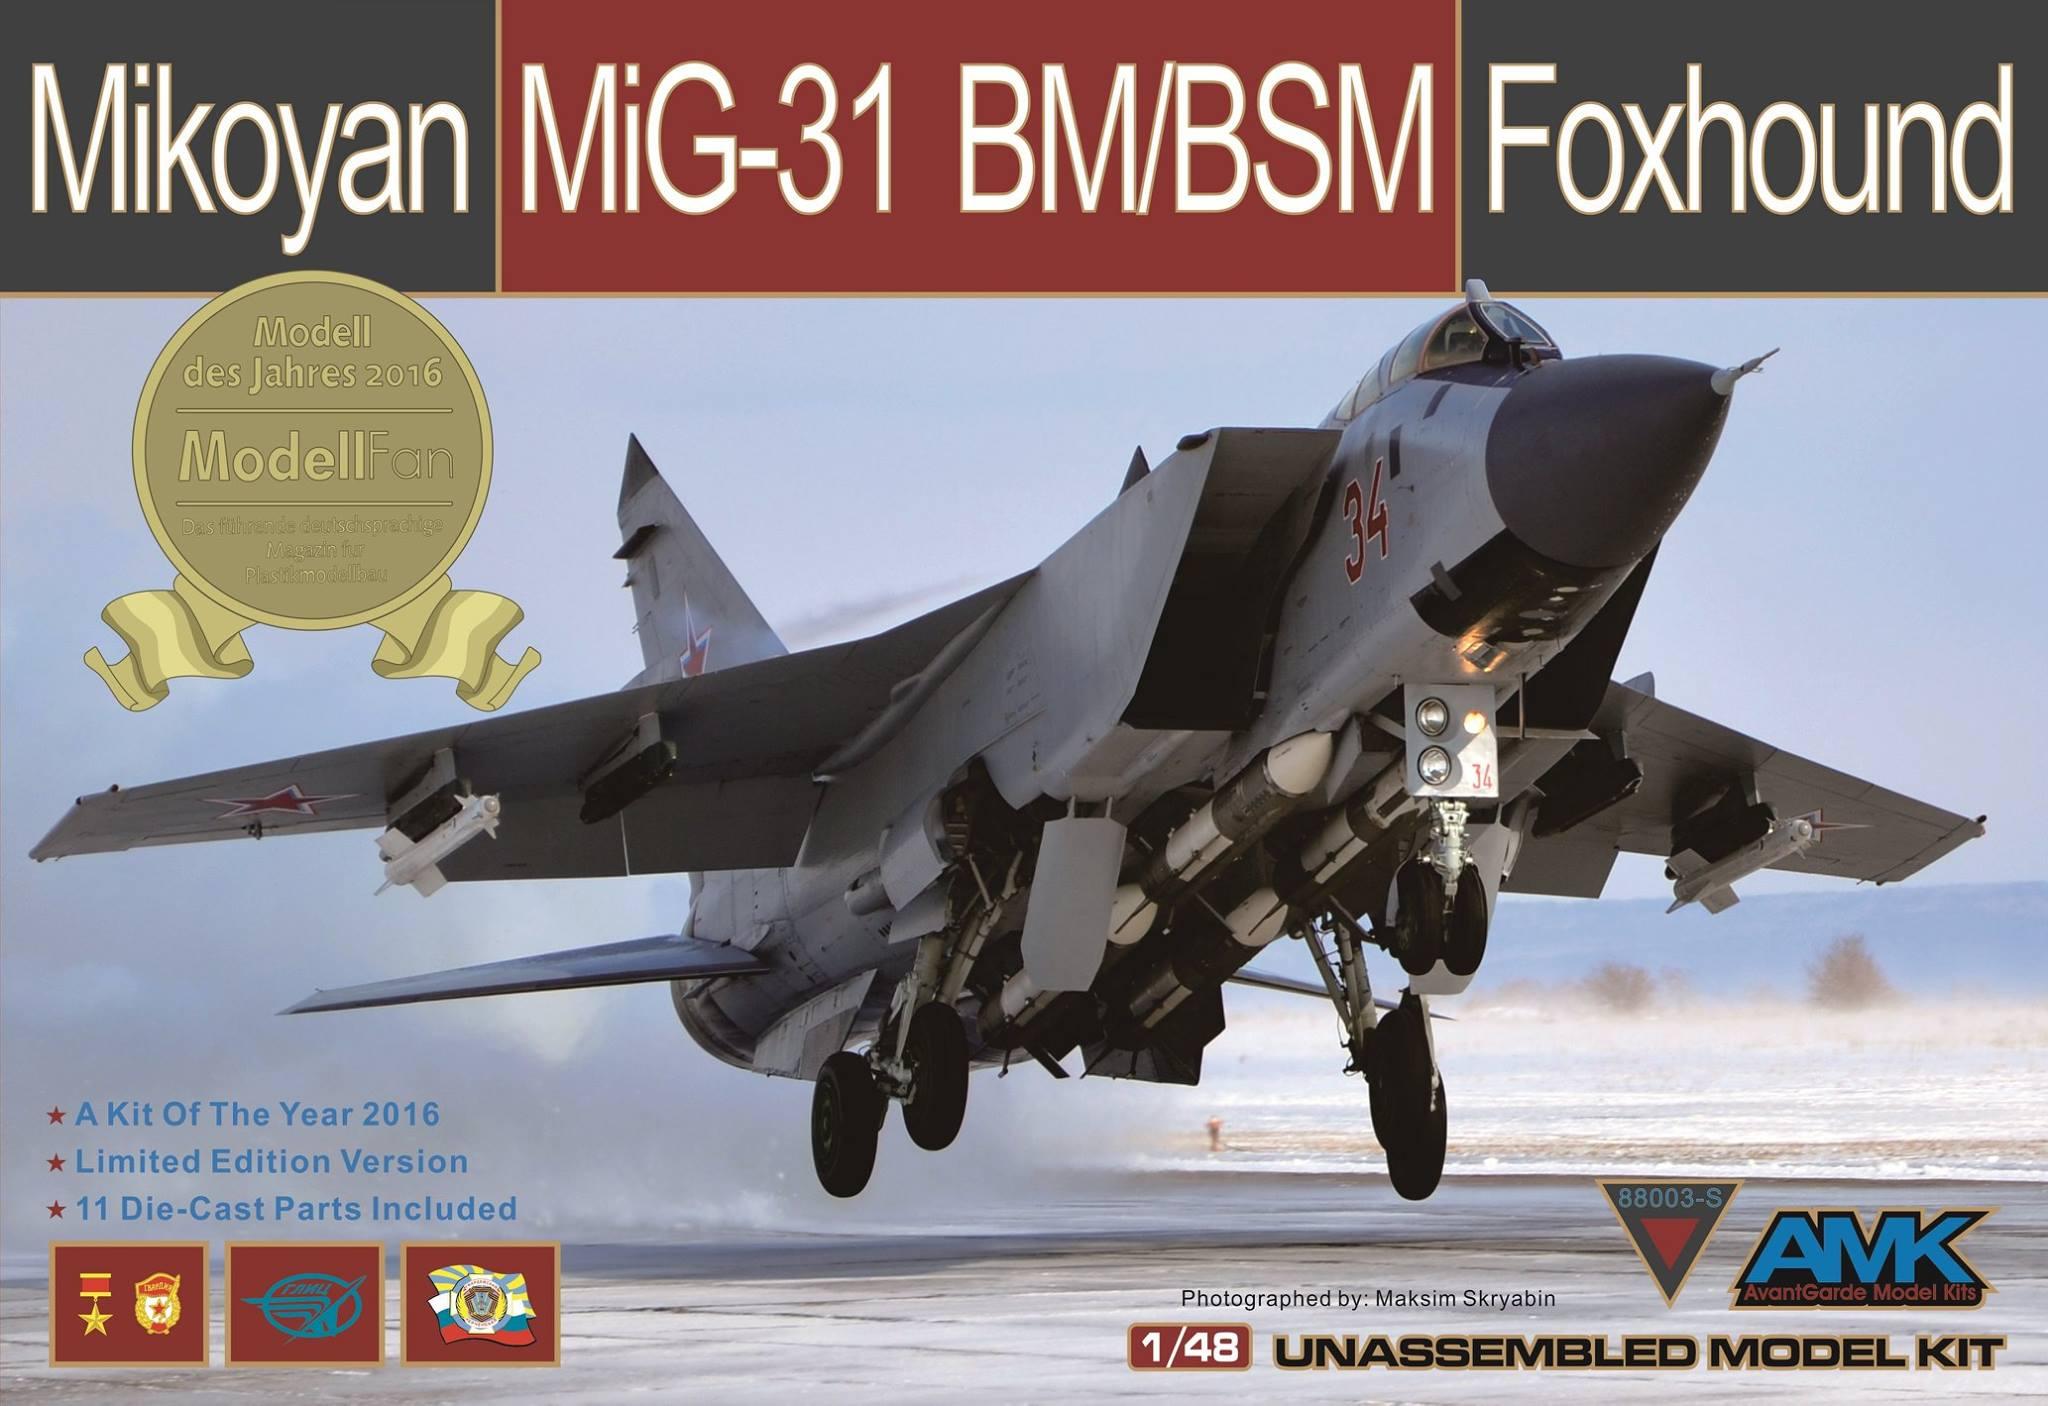 Модель AMK 1/48 Mikoyan MiG31 BM/BSM Foxhound Limited Edition